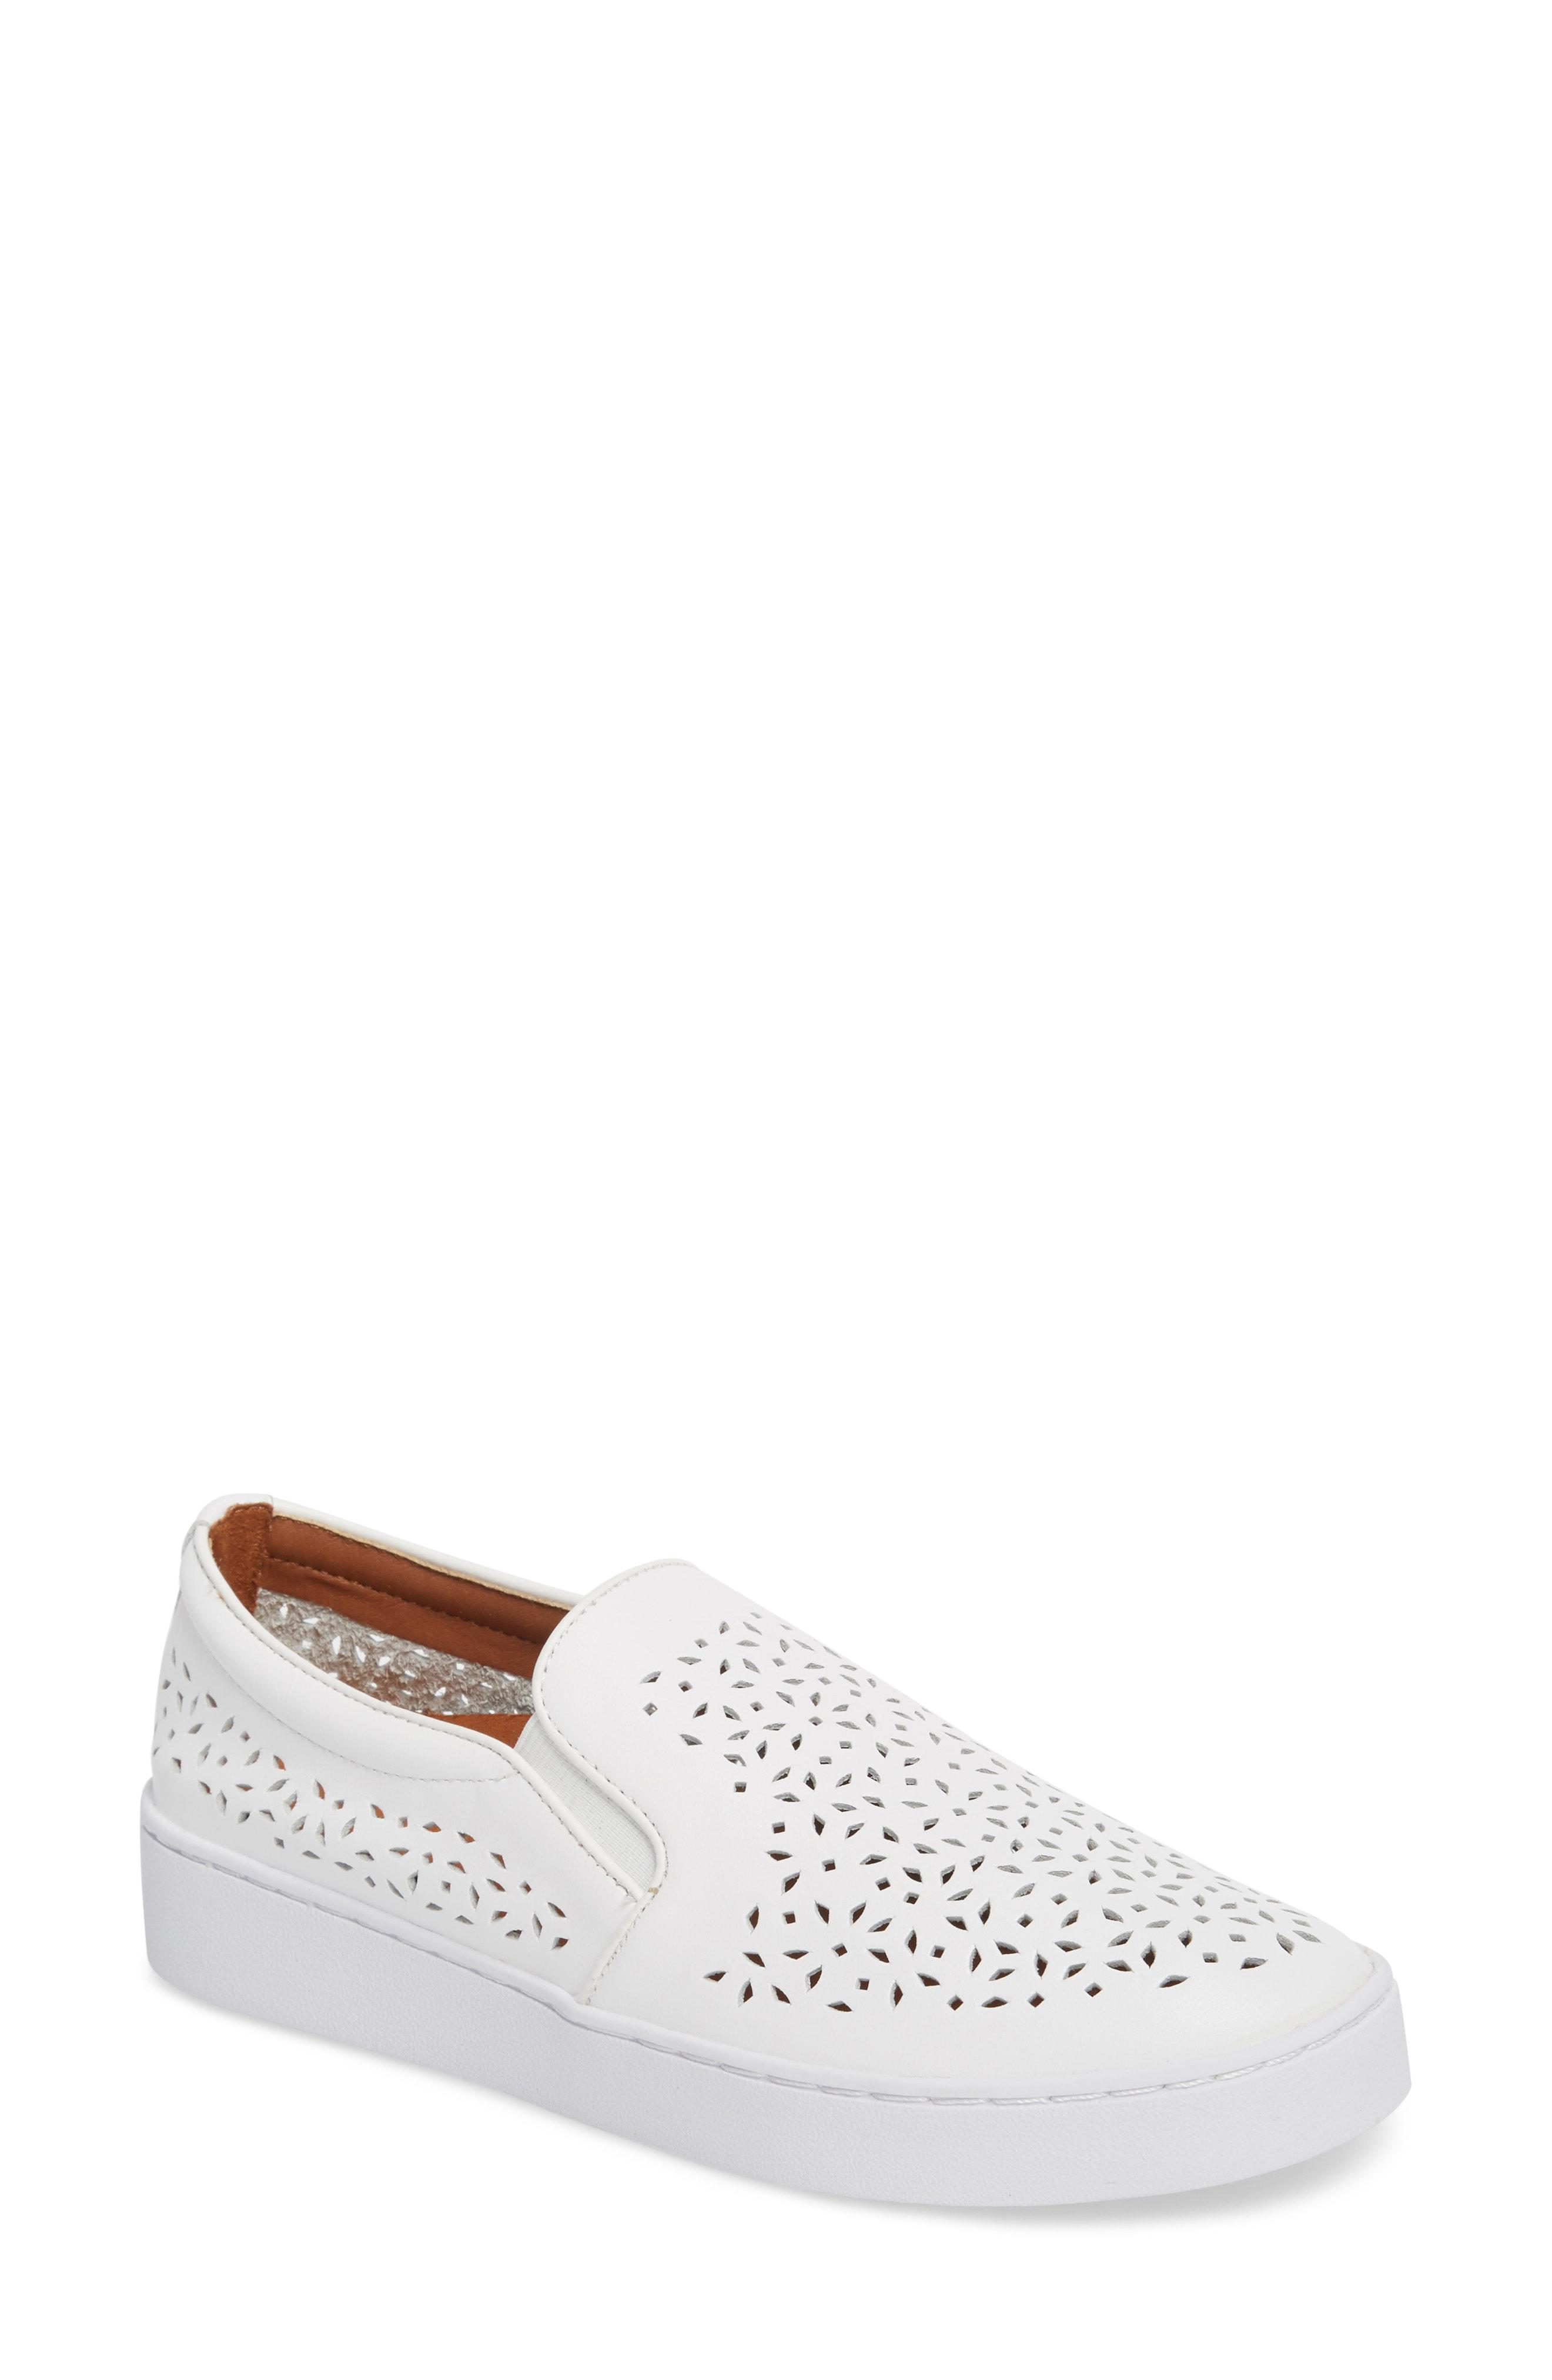 Vionic Perforated Slip-On Sneaker (Women)